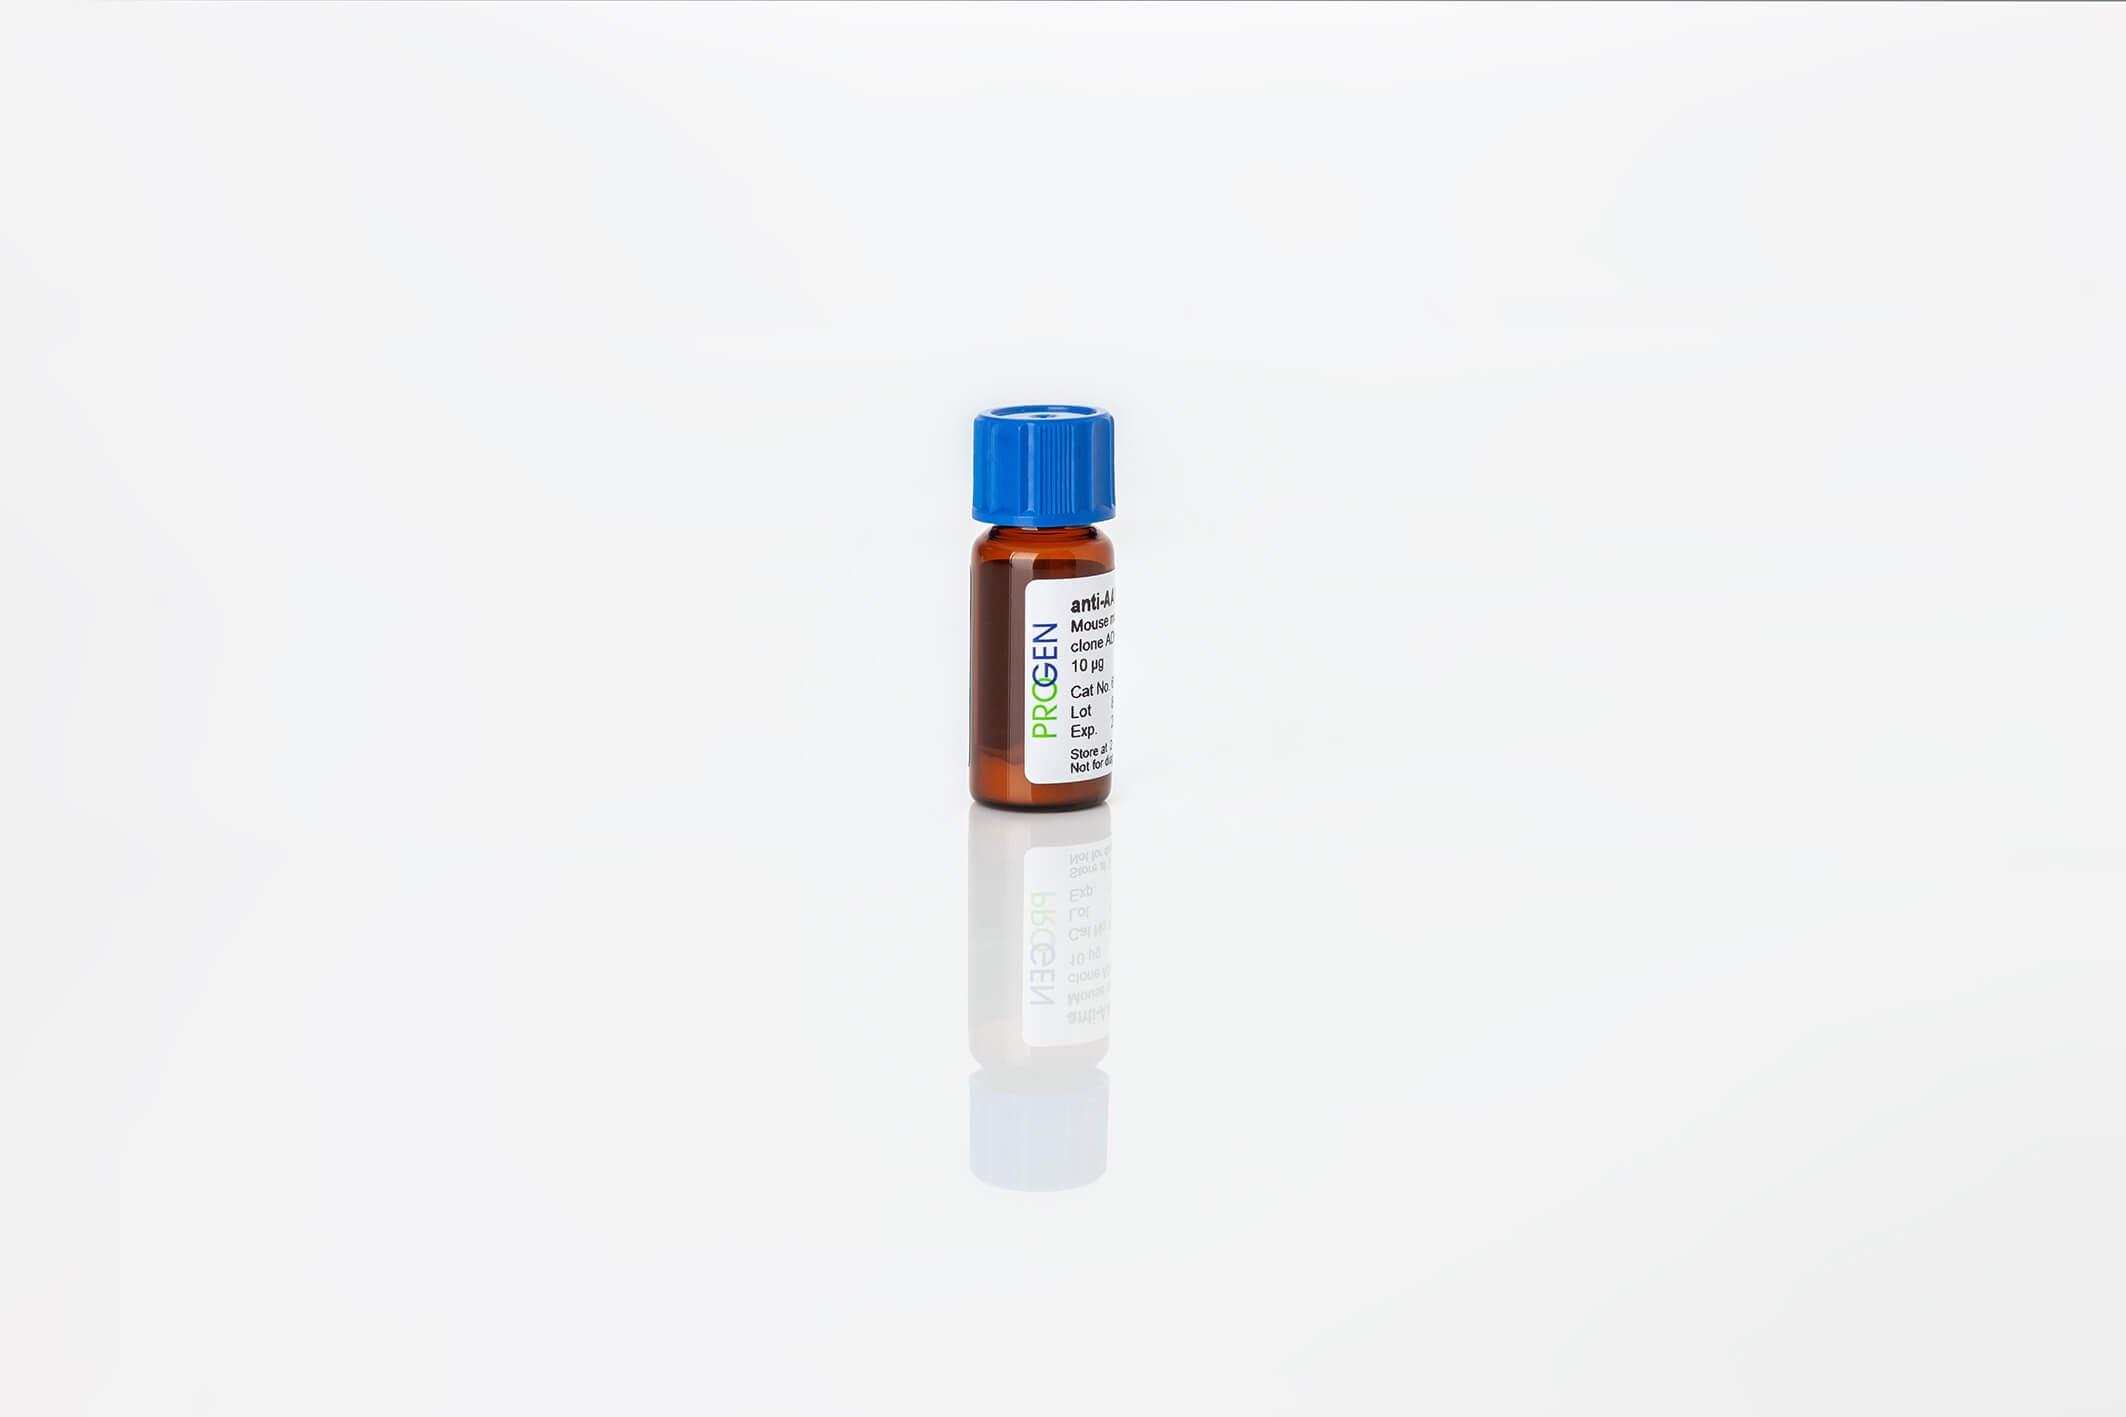 anti-Calcitonin Gene Related Peptide (rat) guinea pig polyclonal, serum